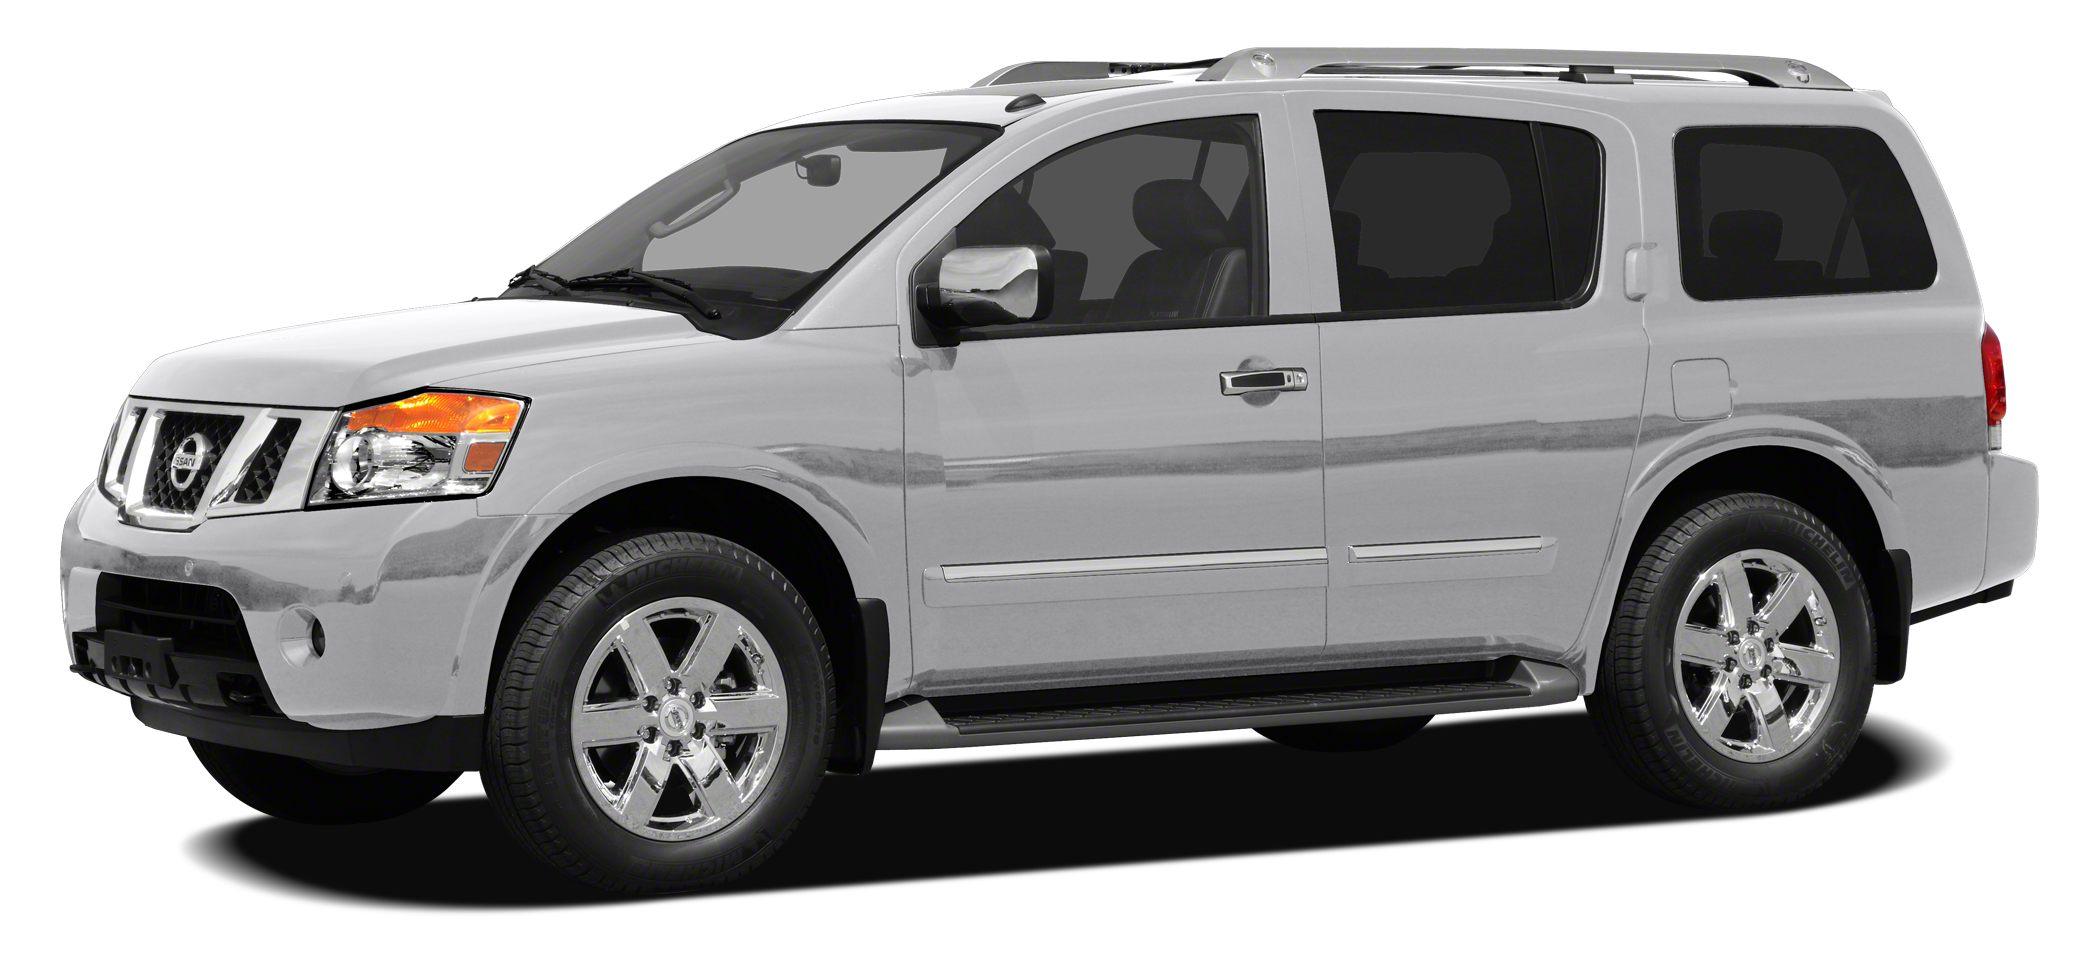 2010 Nissan Armada Platinum Miles 116303Color Silver Lightning Stock AN605341 VIN 5N1BA0NFXA